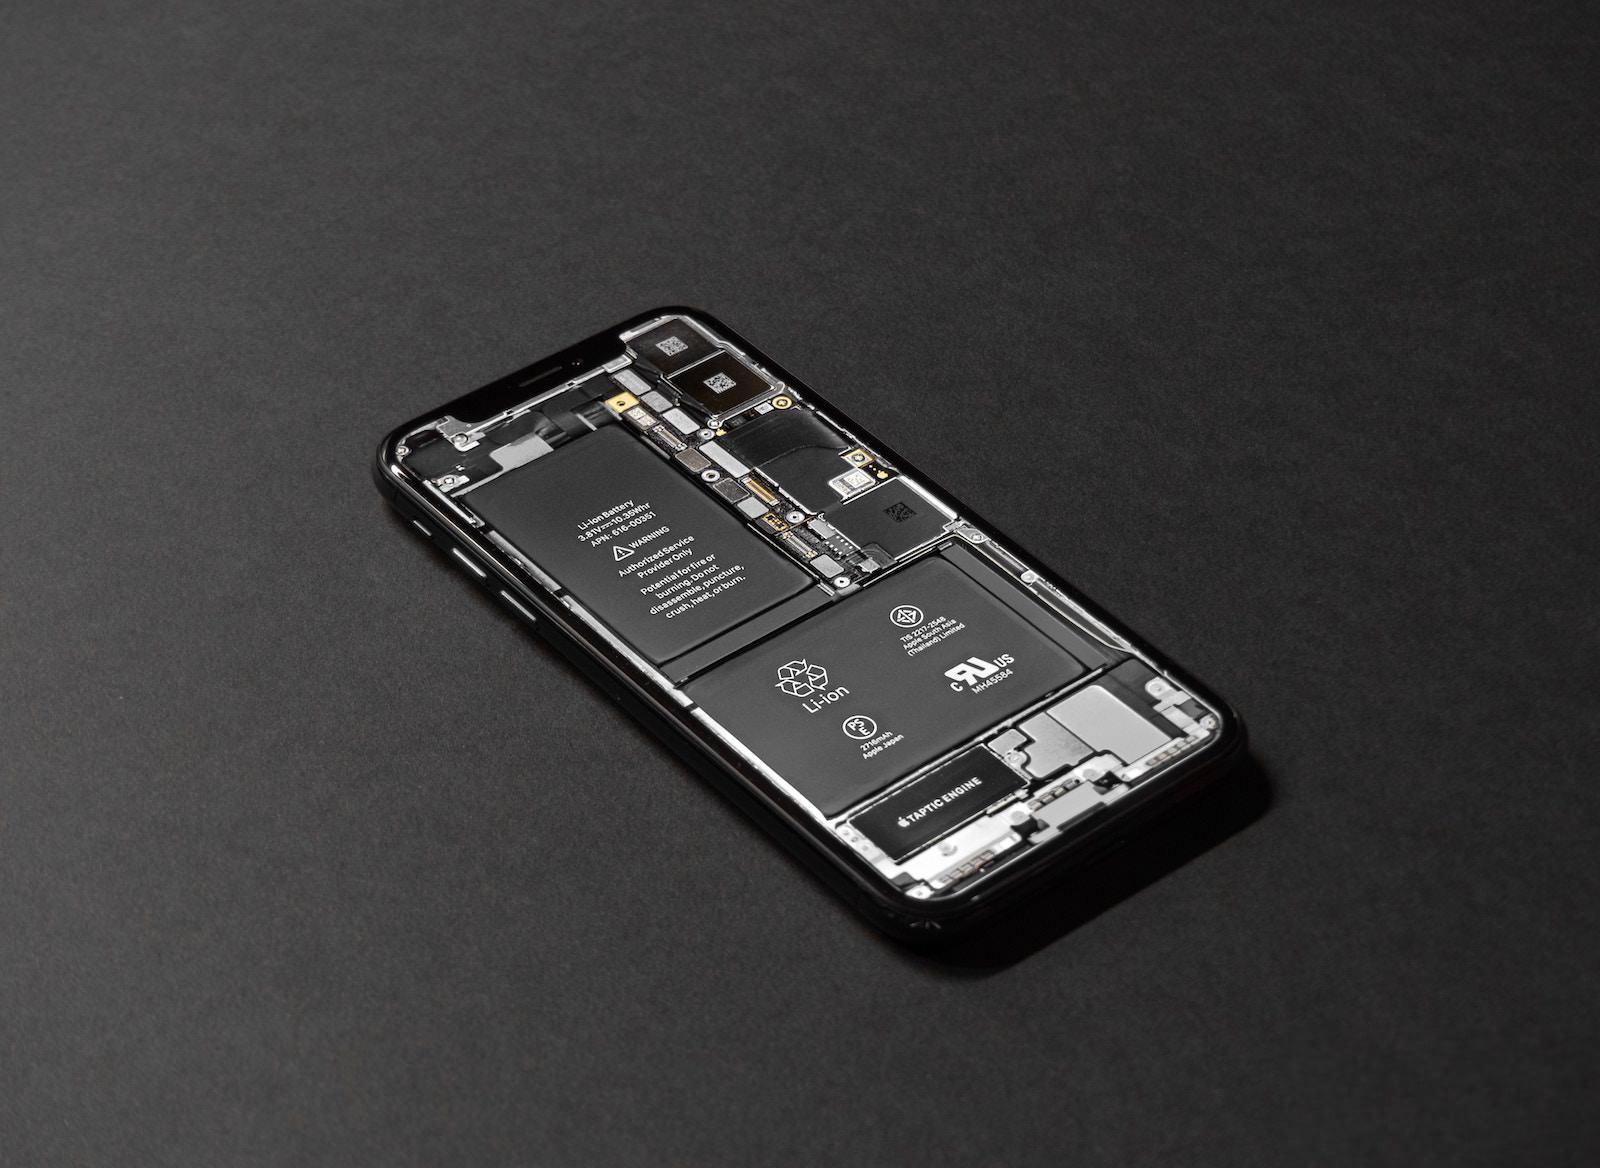 Tyler lastovich rAtzDB6hWrU unsplash iphone battery see through